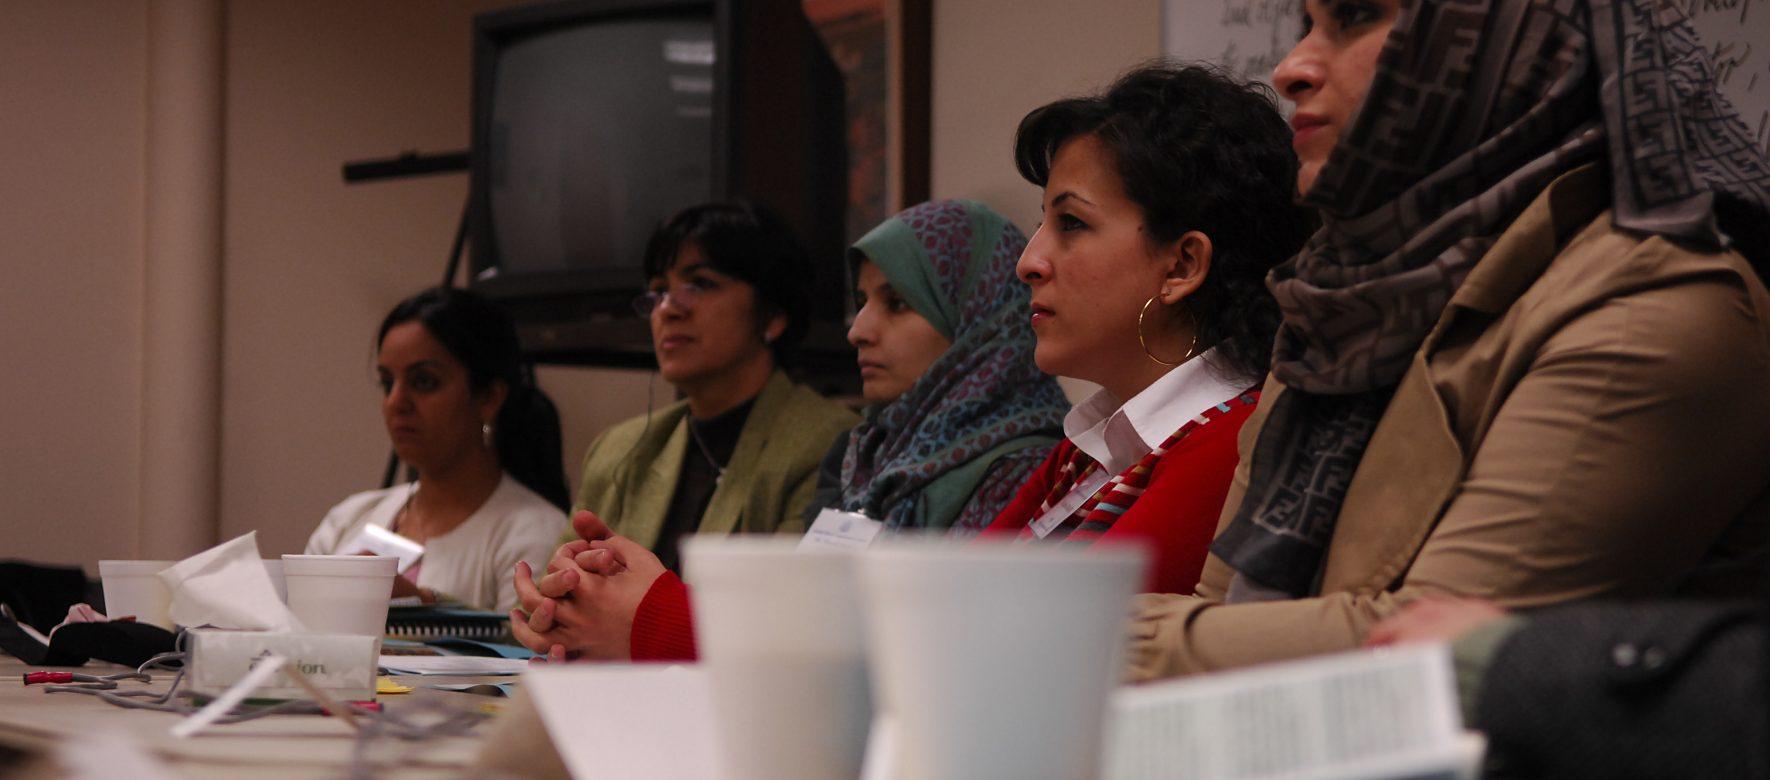 How to improve women economic inclusion in the Mediterranean? 2